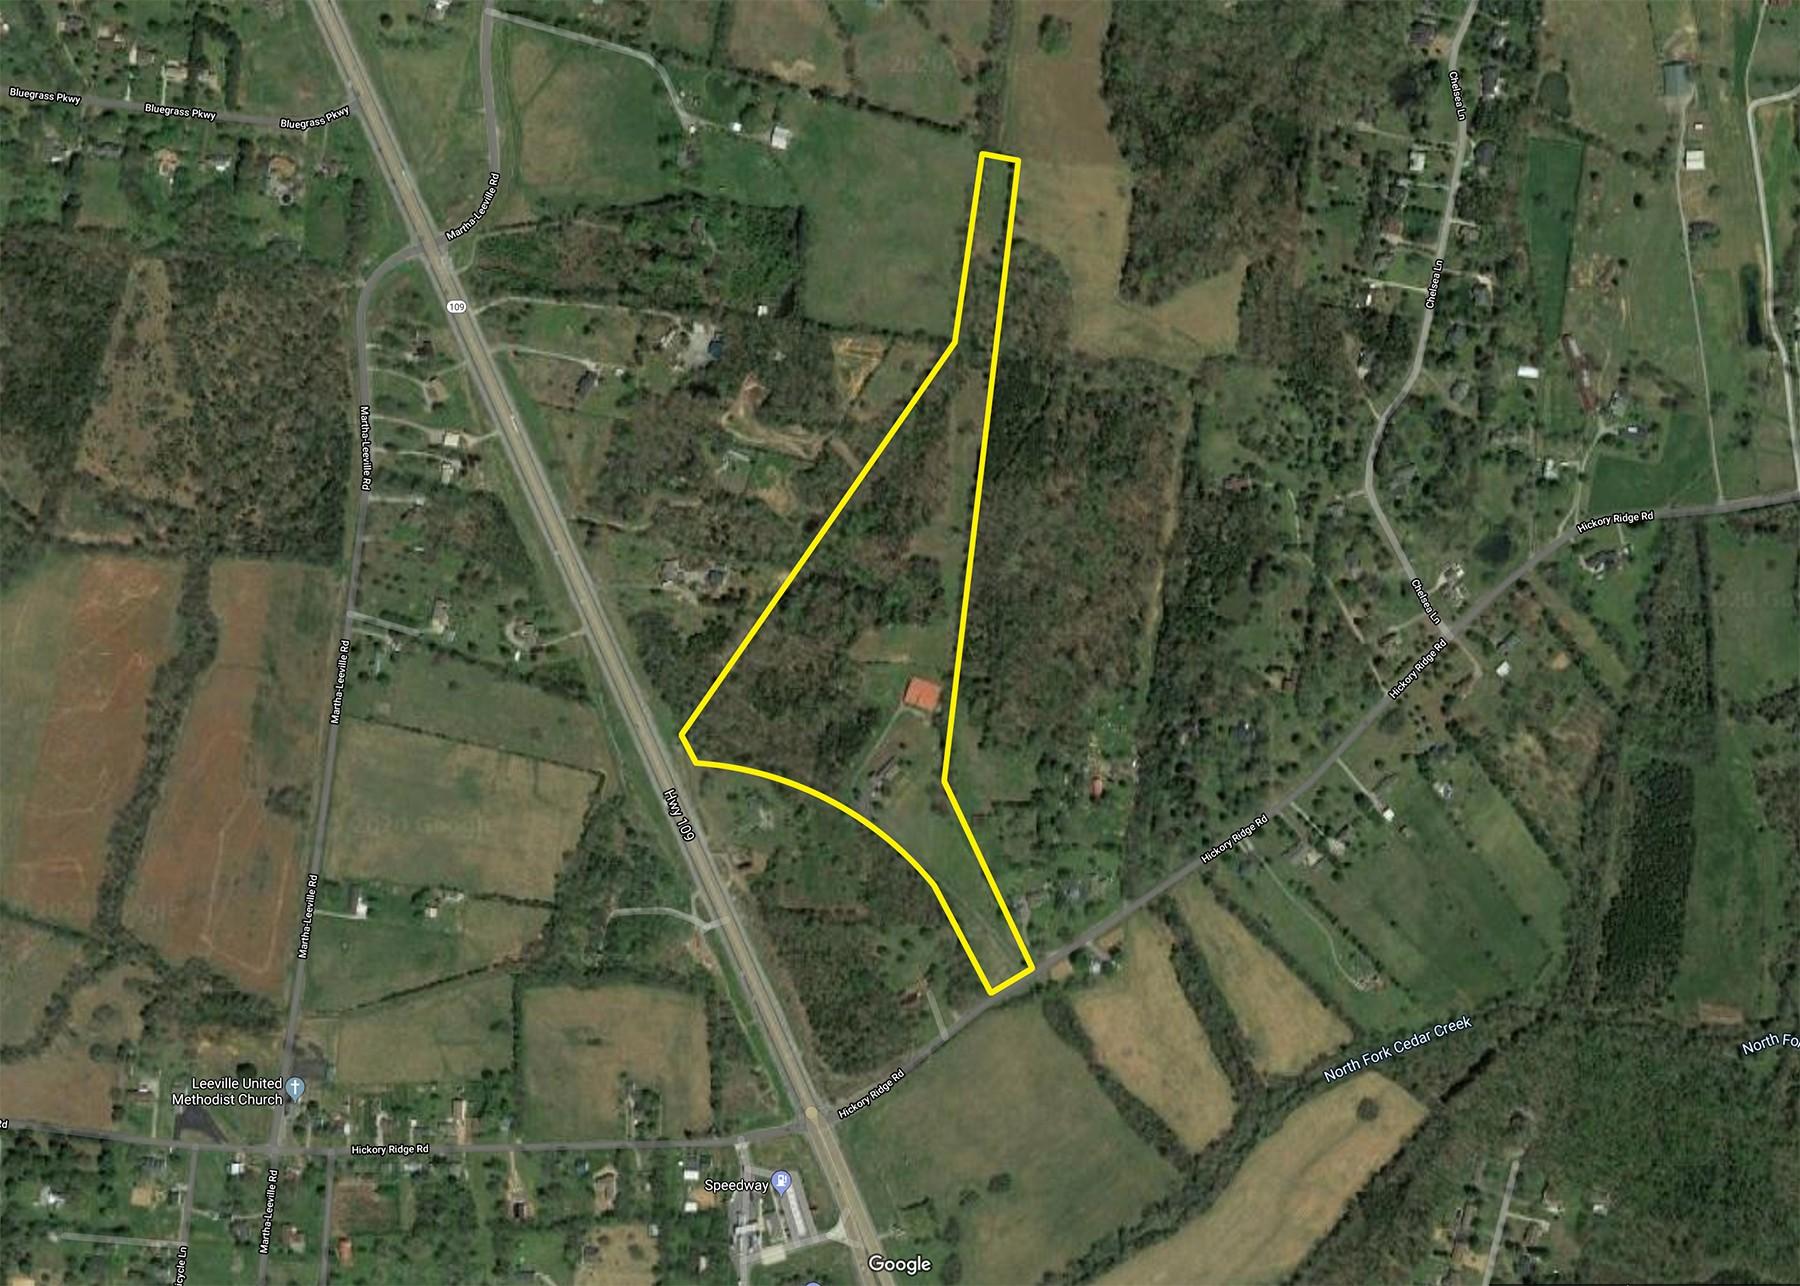 6505 Hickory Ridge Rd, Lebanon, TN 37087 - Lebanon, TN real estate listing